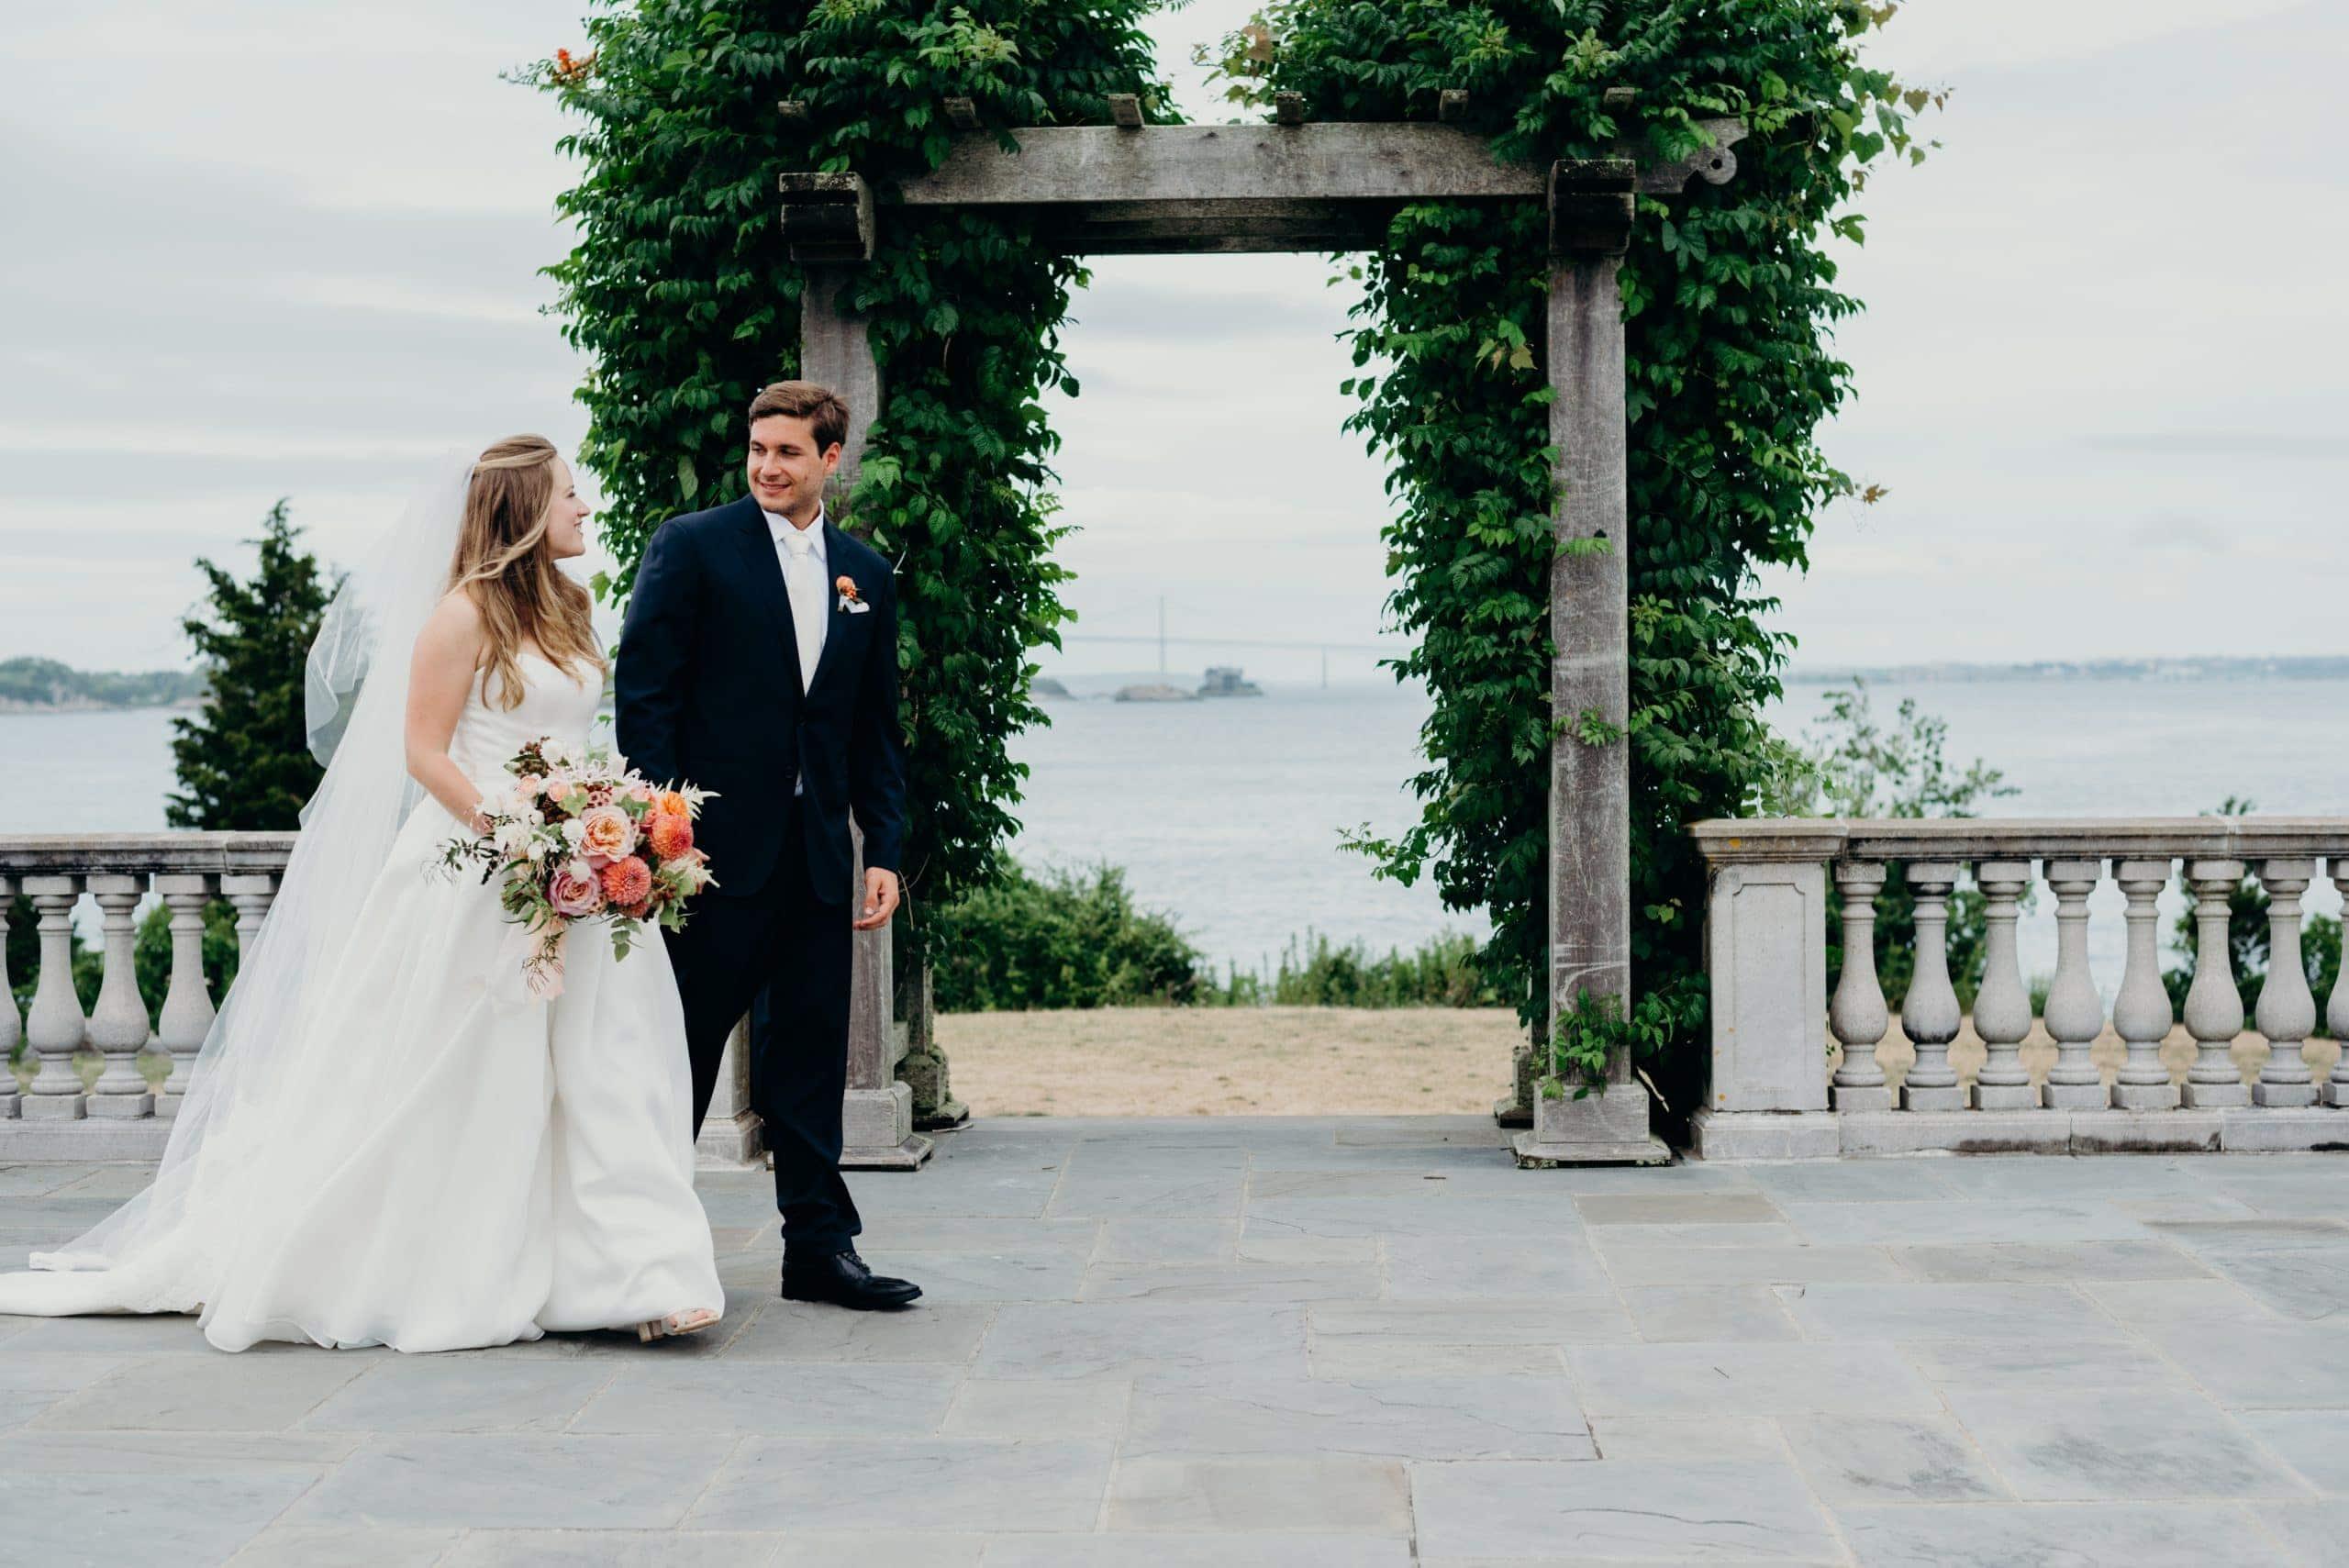 bride and groom walking at castle hill inn Rhode Island